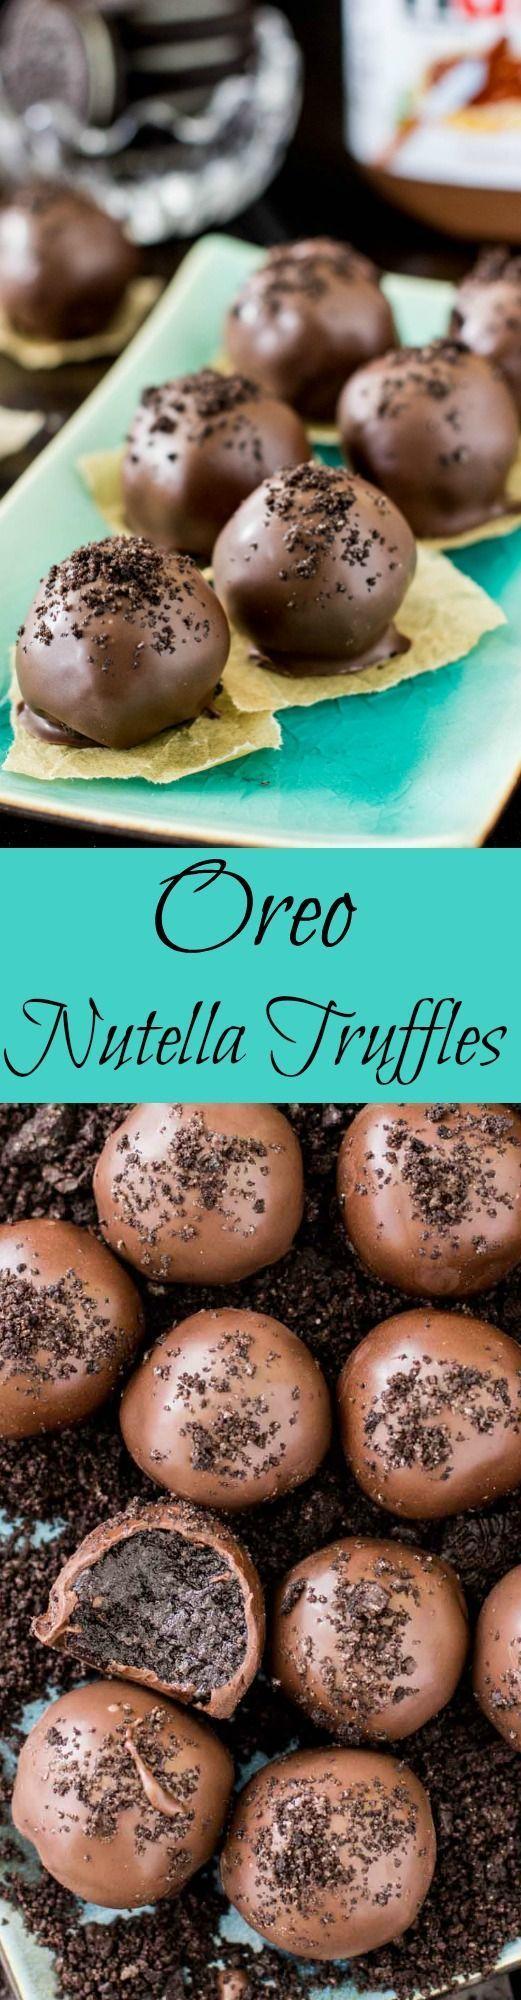 Oreo nutella truffles